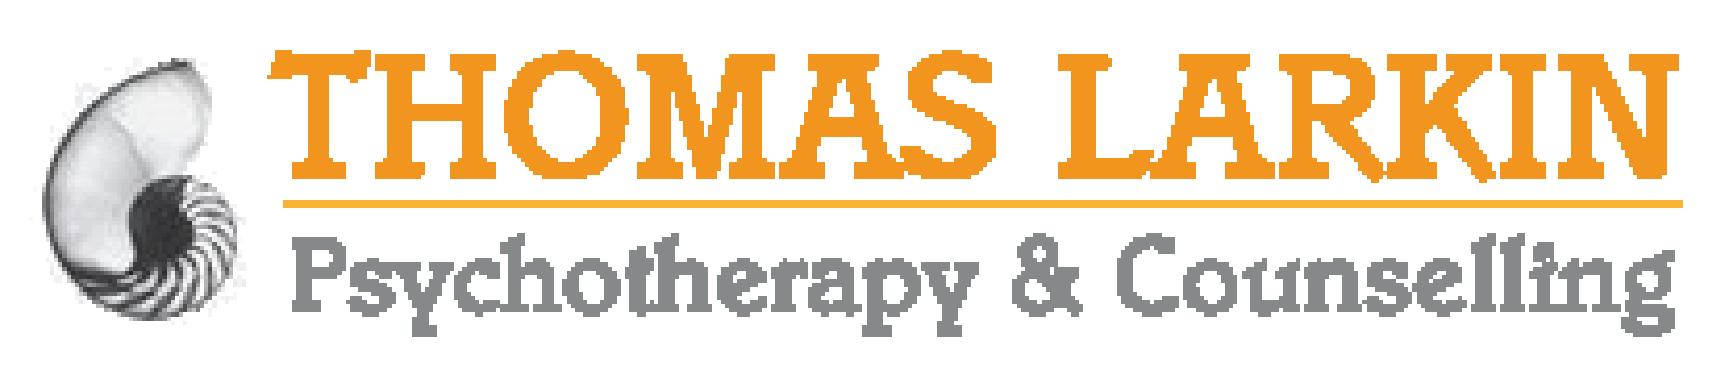 Thomas Larkin Counselling, Pychotherapy, CBT Dublin City